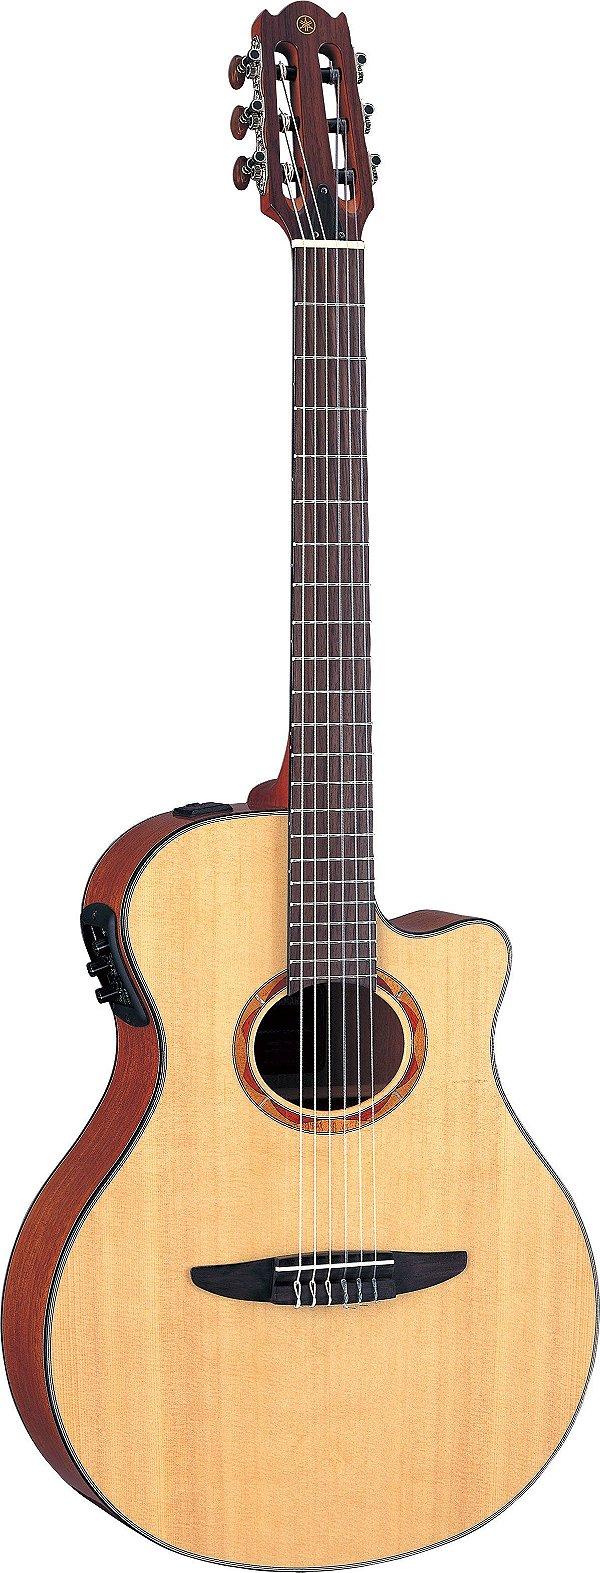 Violão Eletroacústico Yamaha Nylon NTX700 Natural